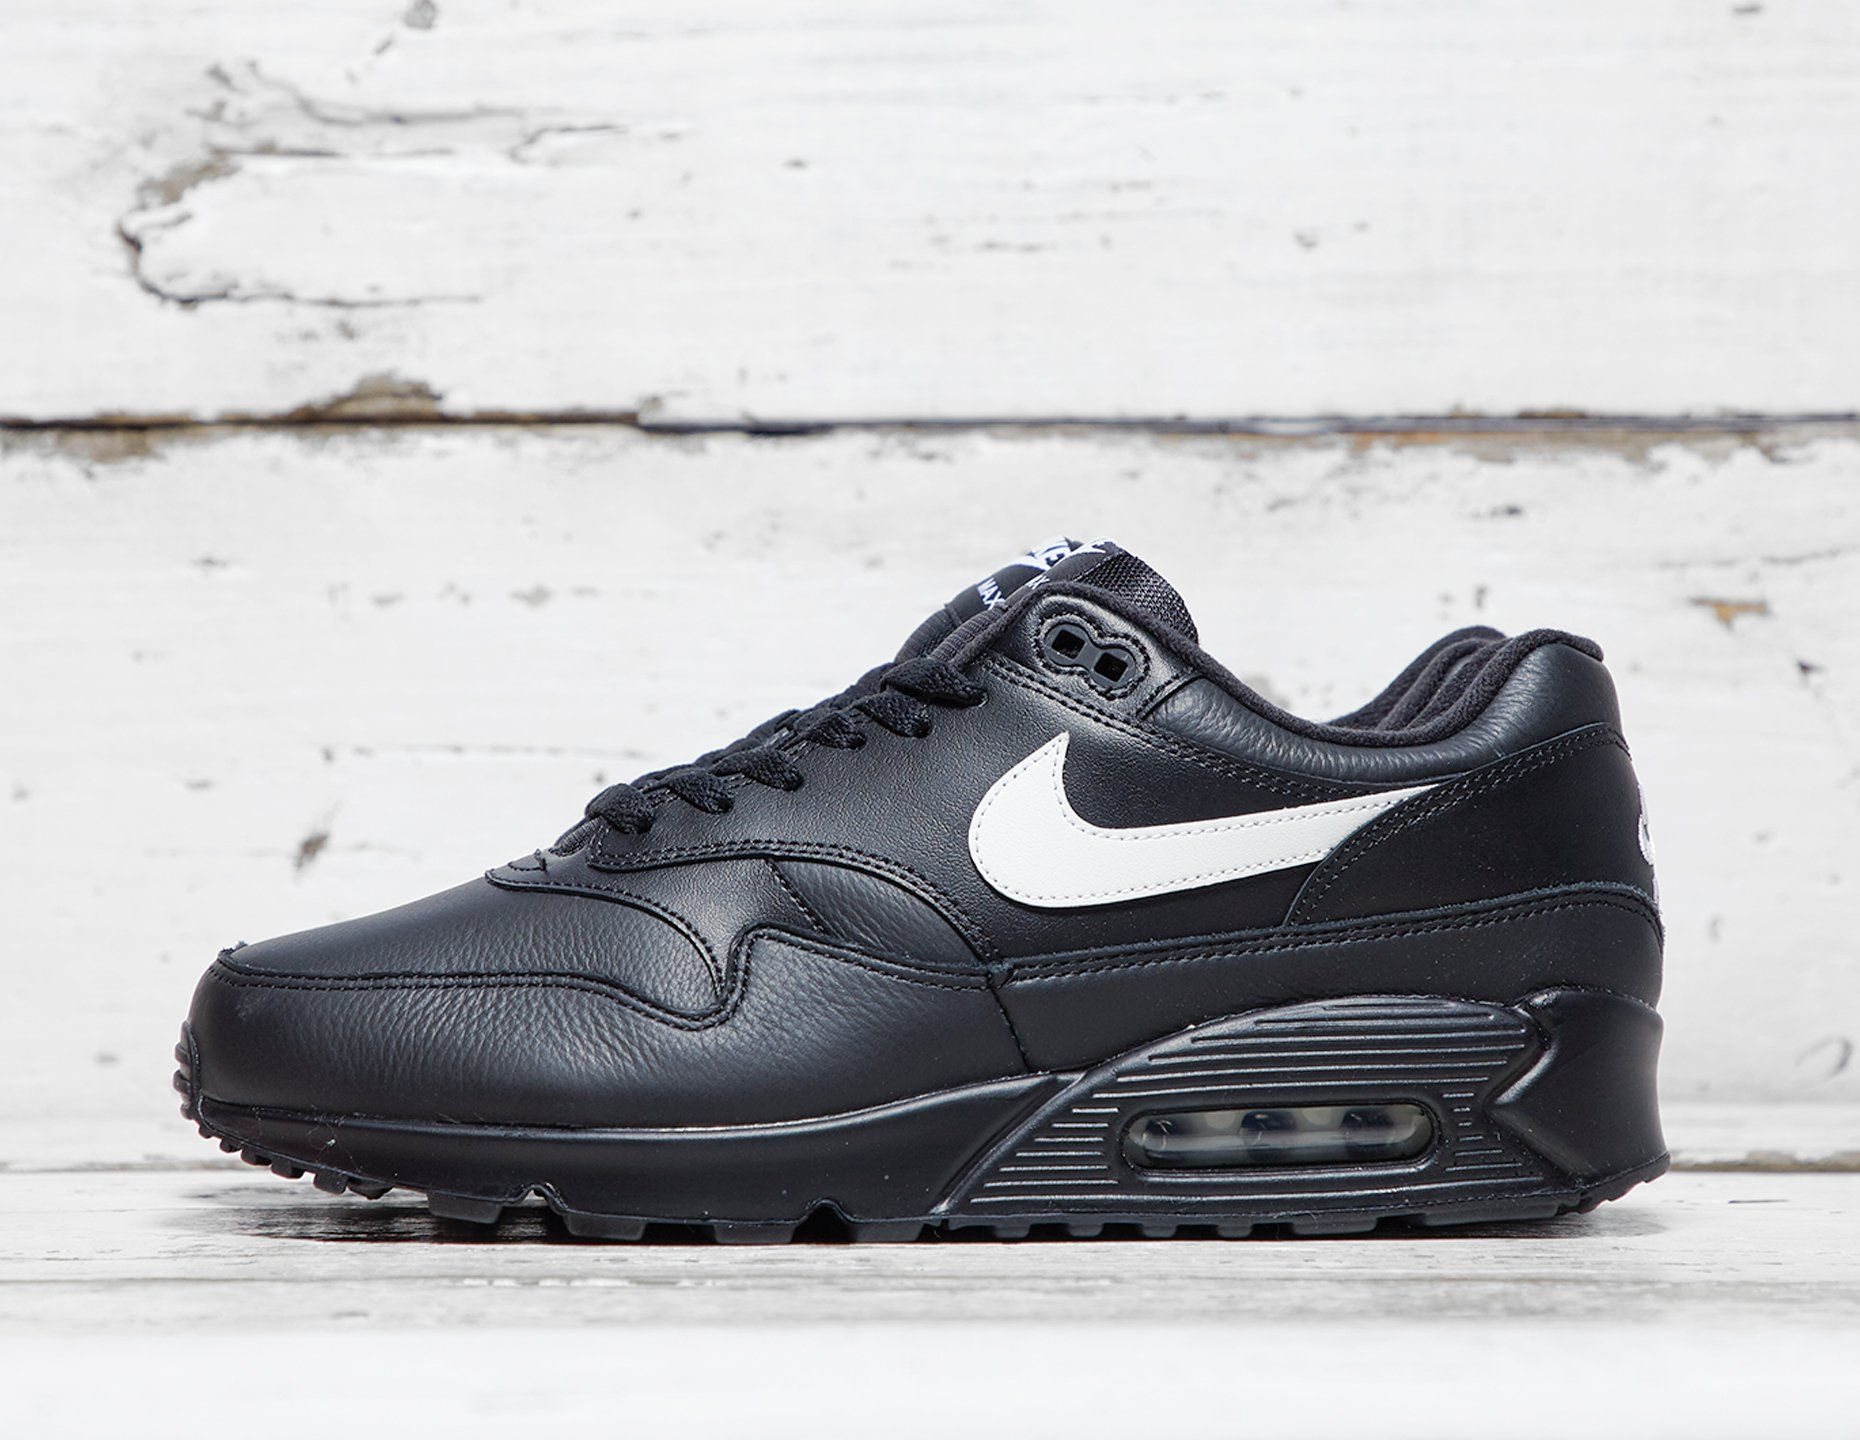 pretty nice 58798 fba30 ... Nike Air Max 90 1 Footpatrol ...